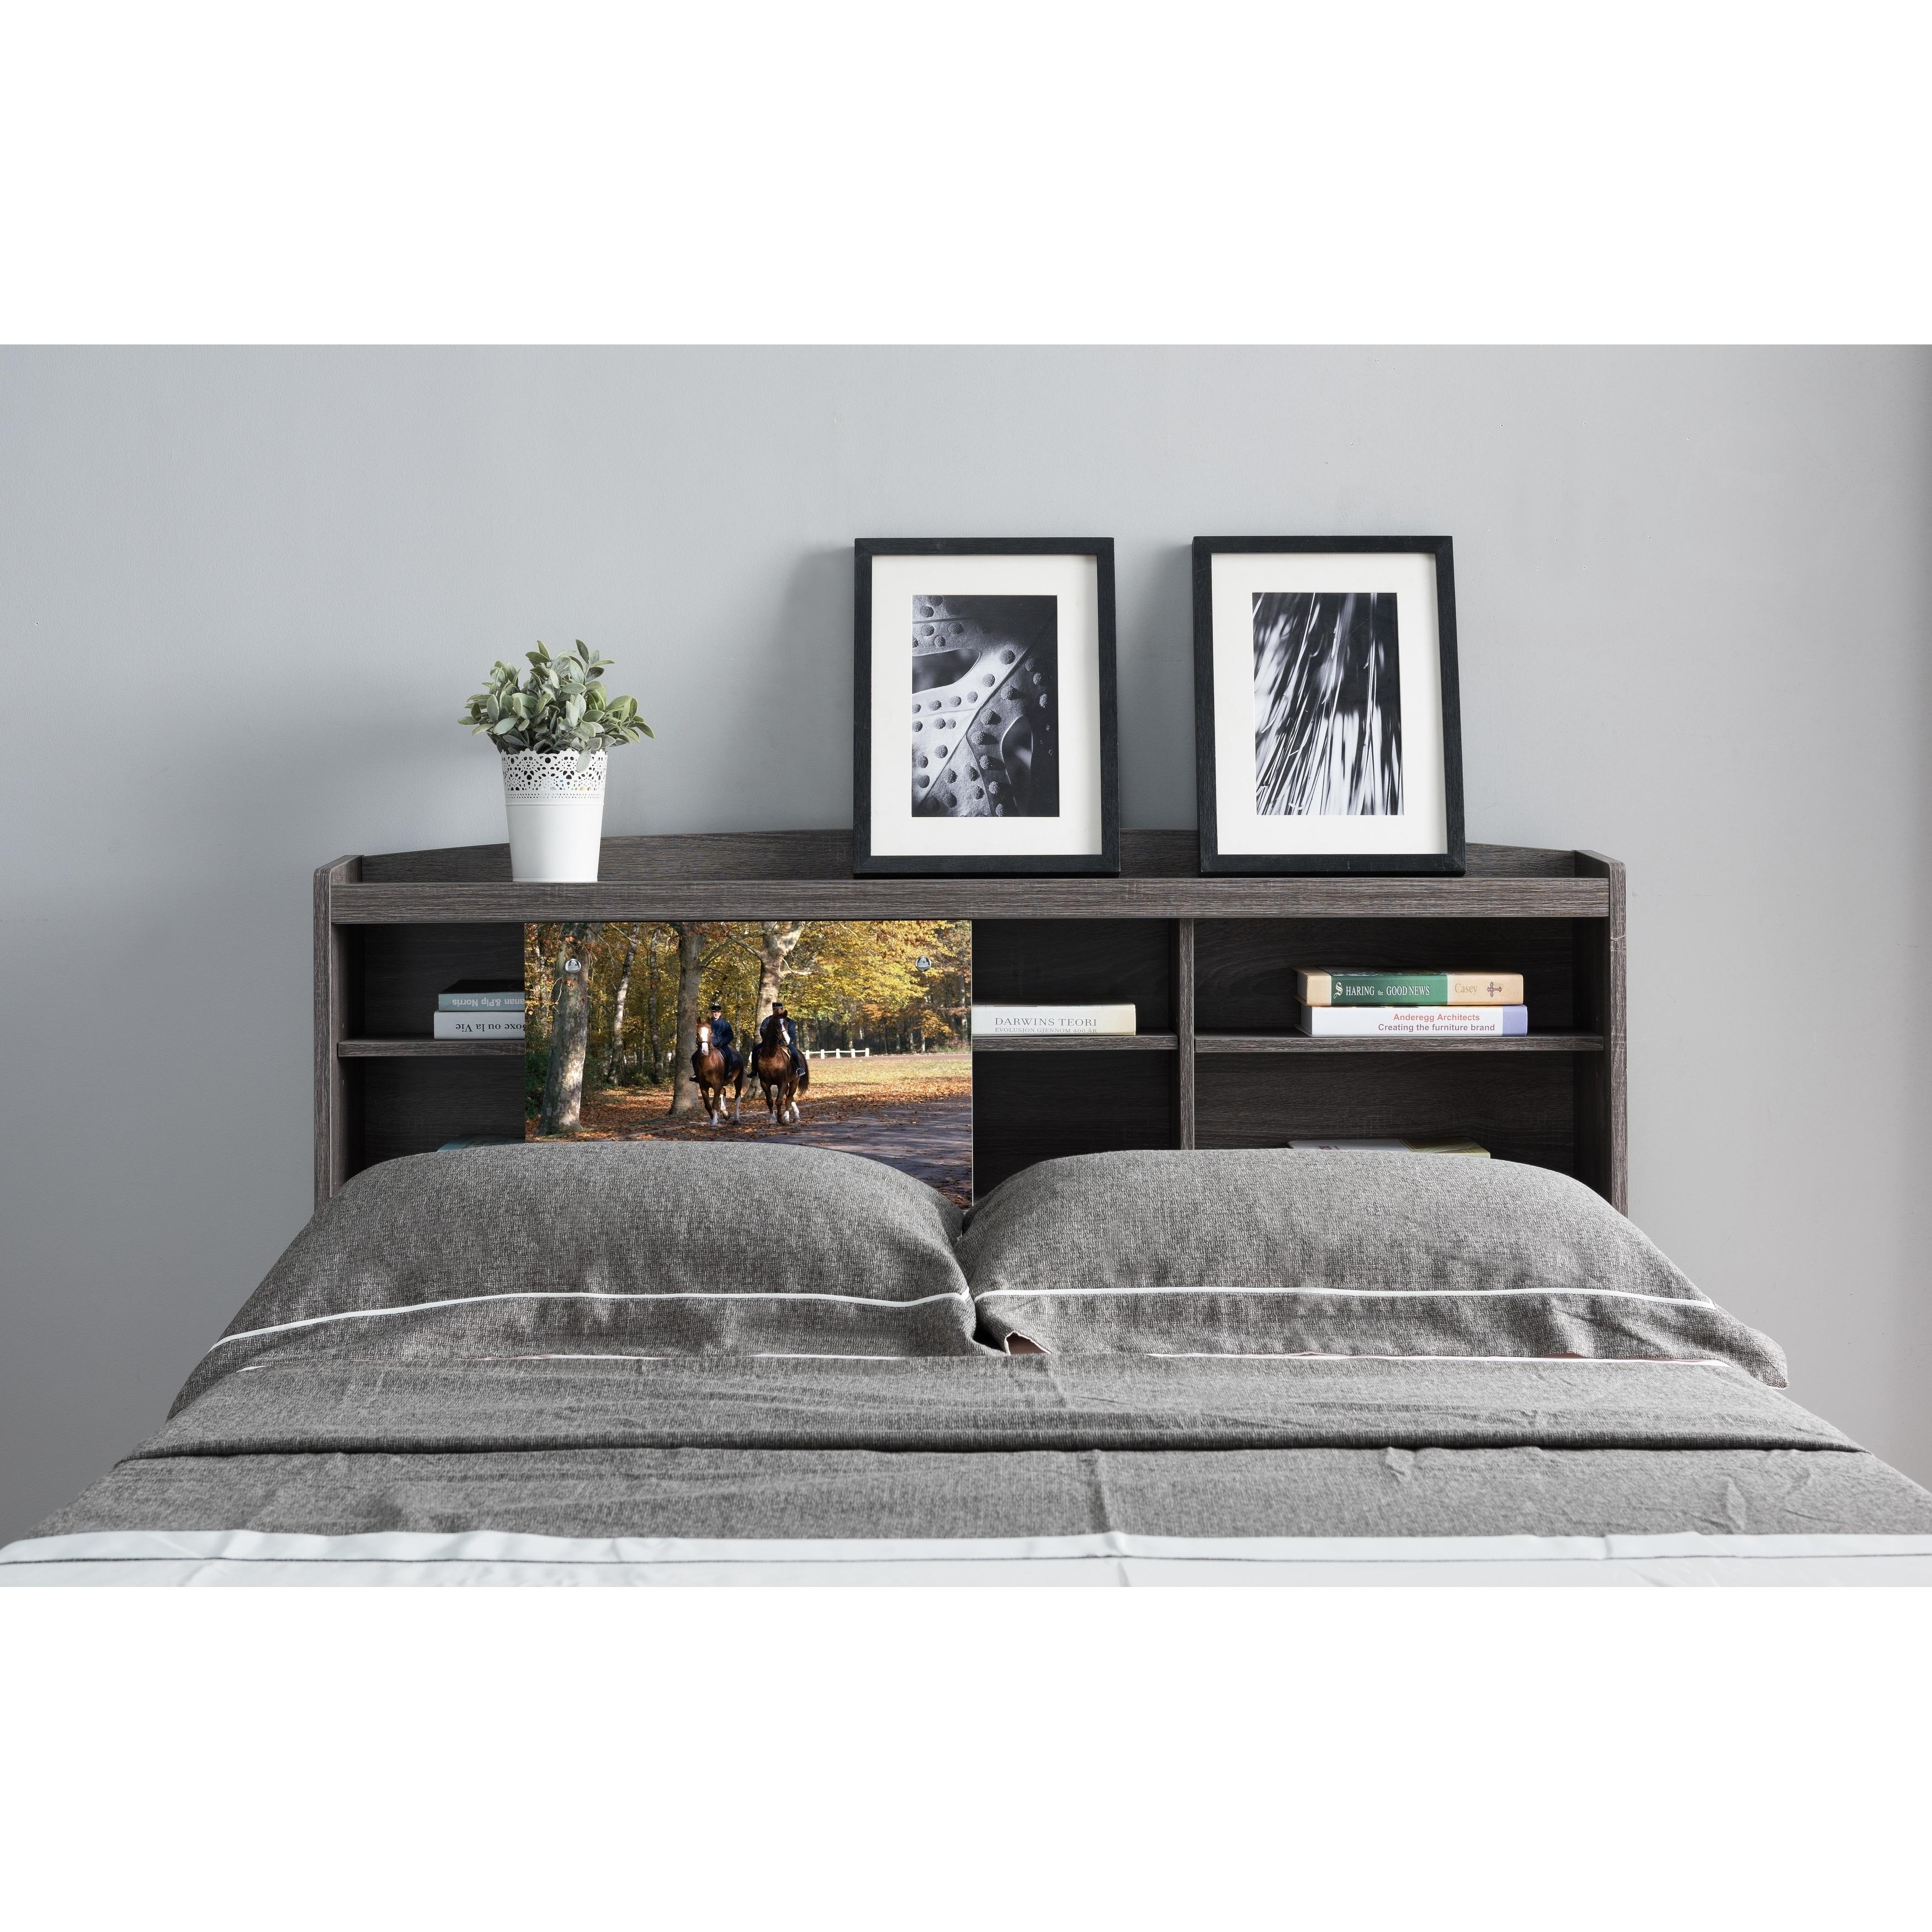 Shop Riley Contemporary Distressed Grey Queen Size Bookcase